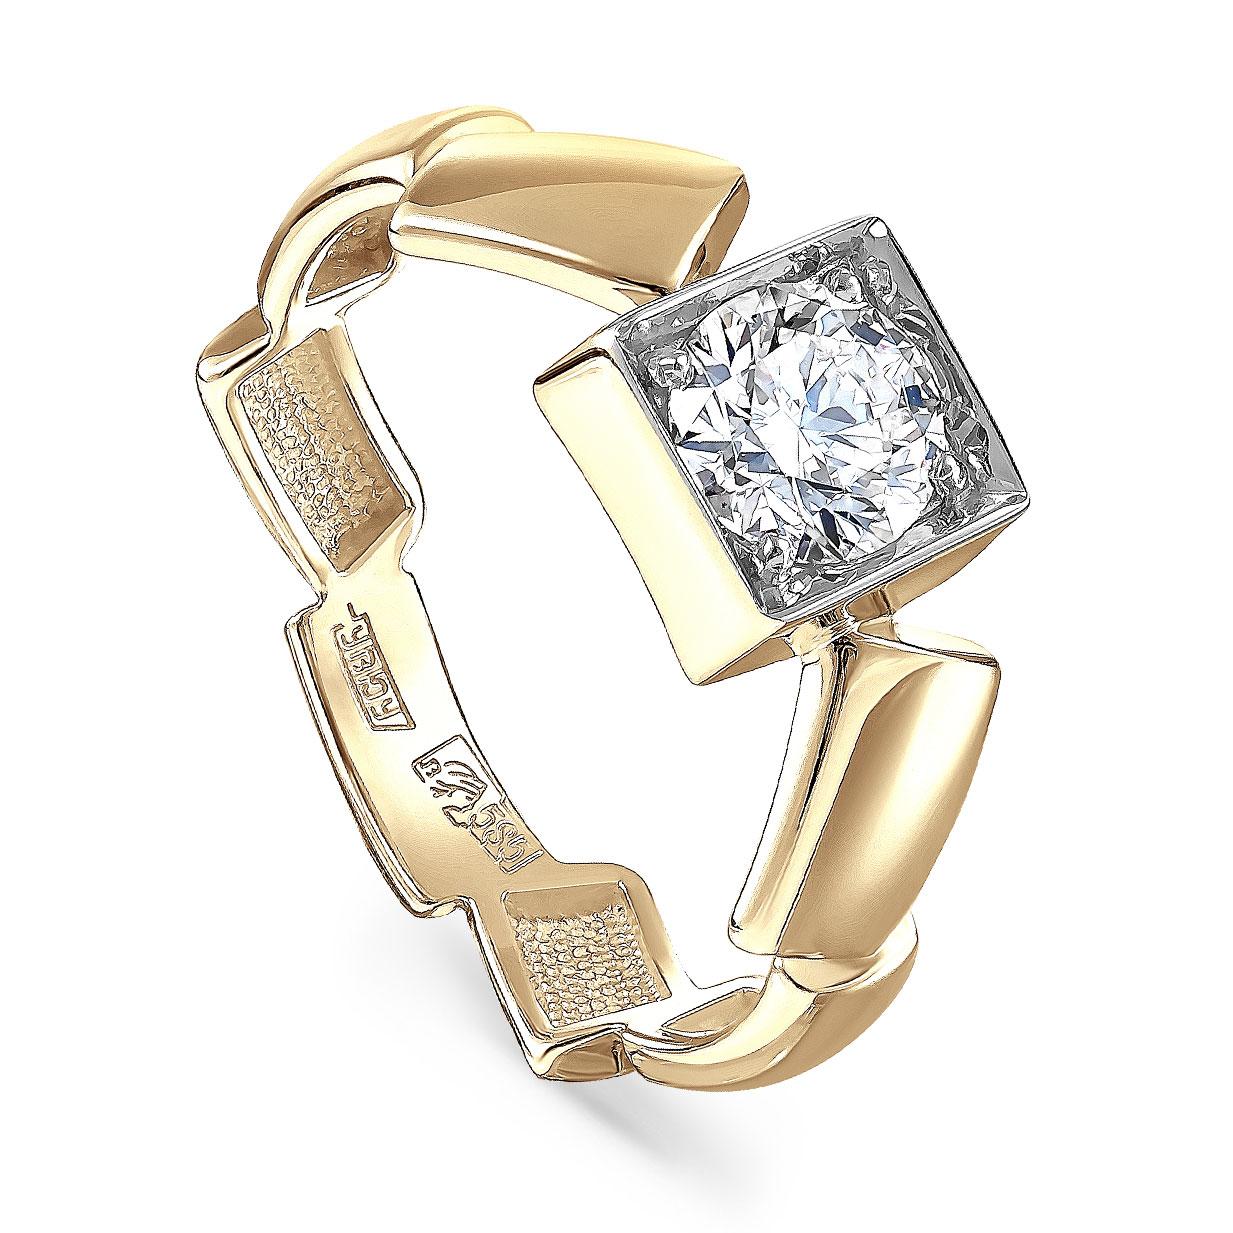 Кольцо из лимонного золота Бриллиант арт. 1-2500-1000 1-2500-1000